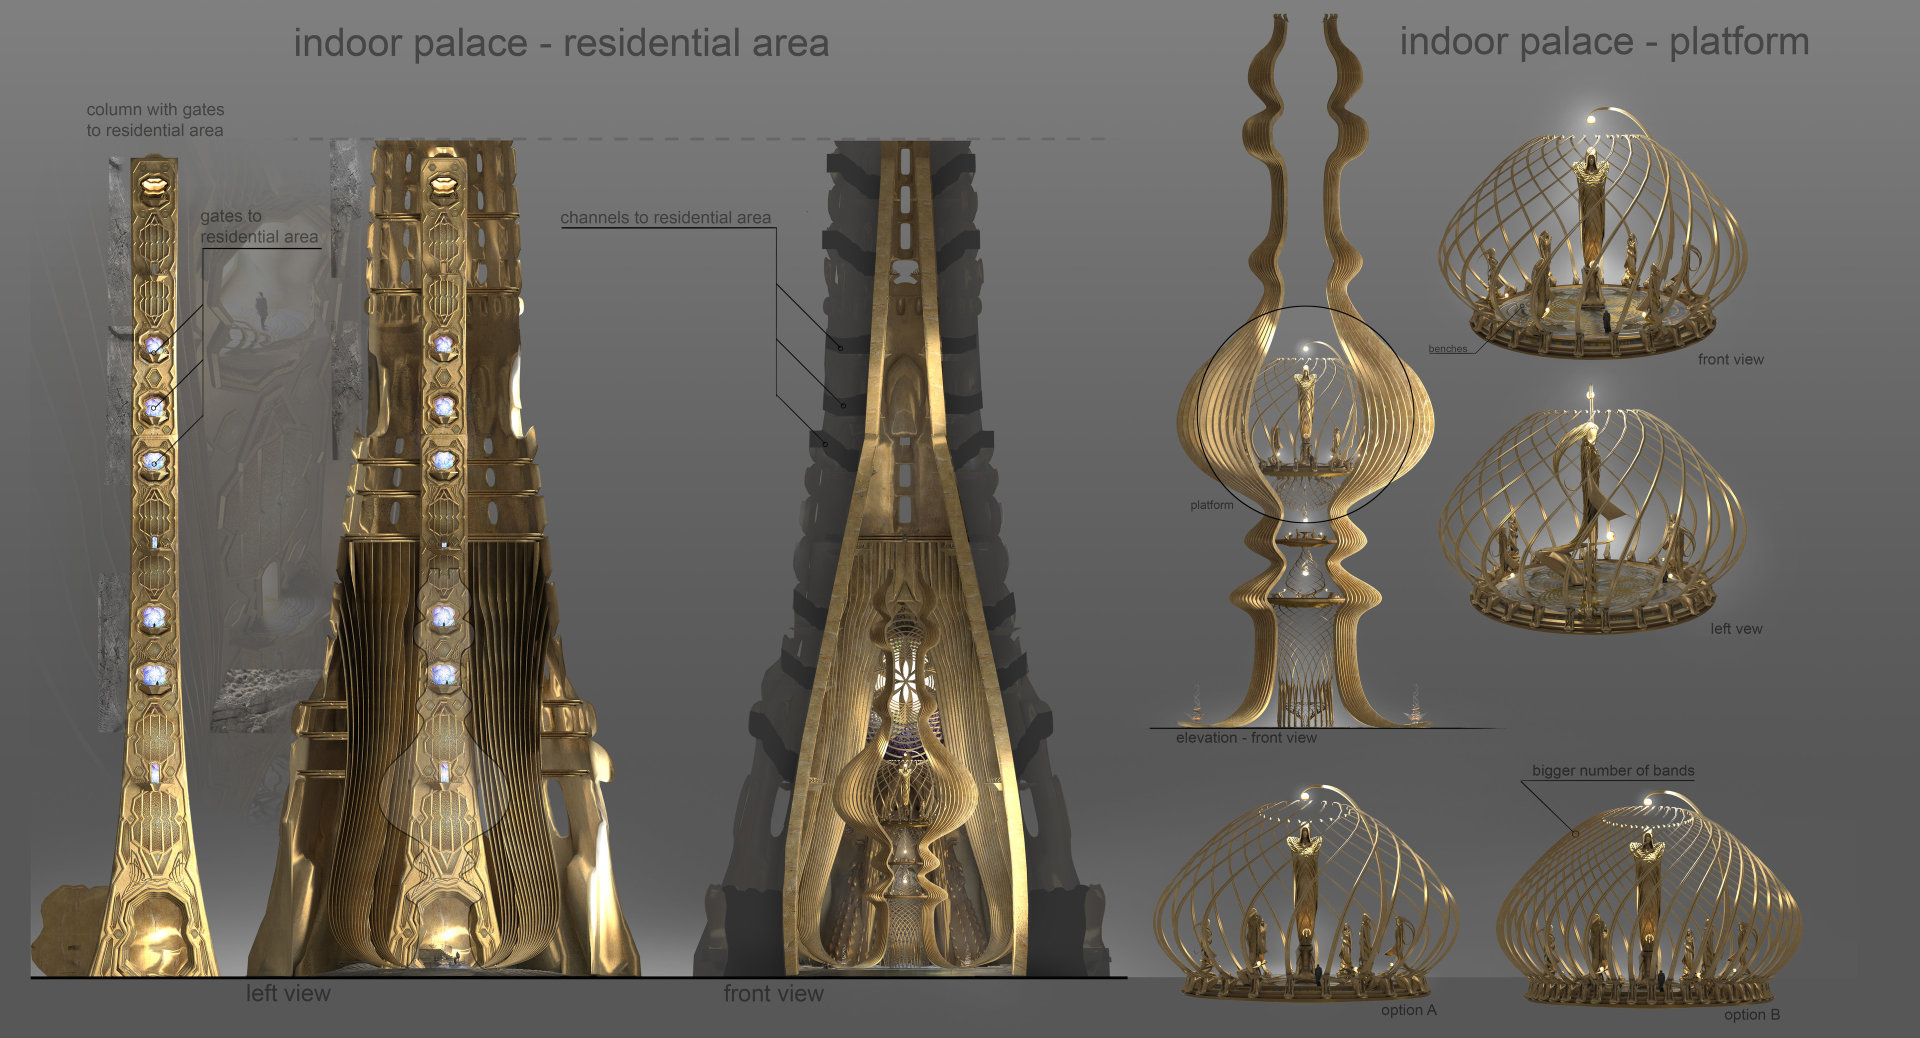 Quelle: ArtStation - Armando Savoia - Indoor Palace Residential Area